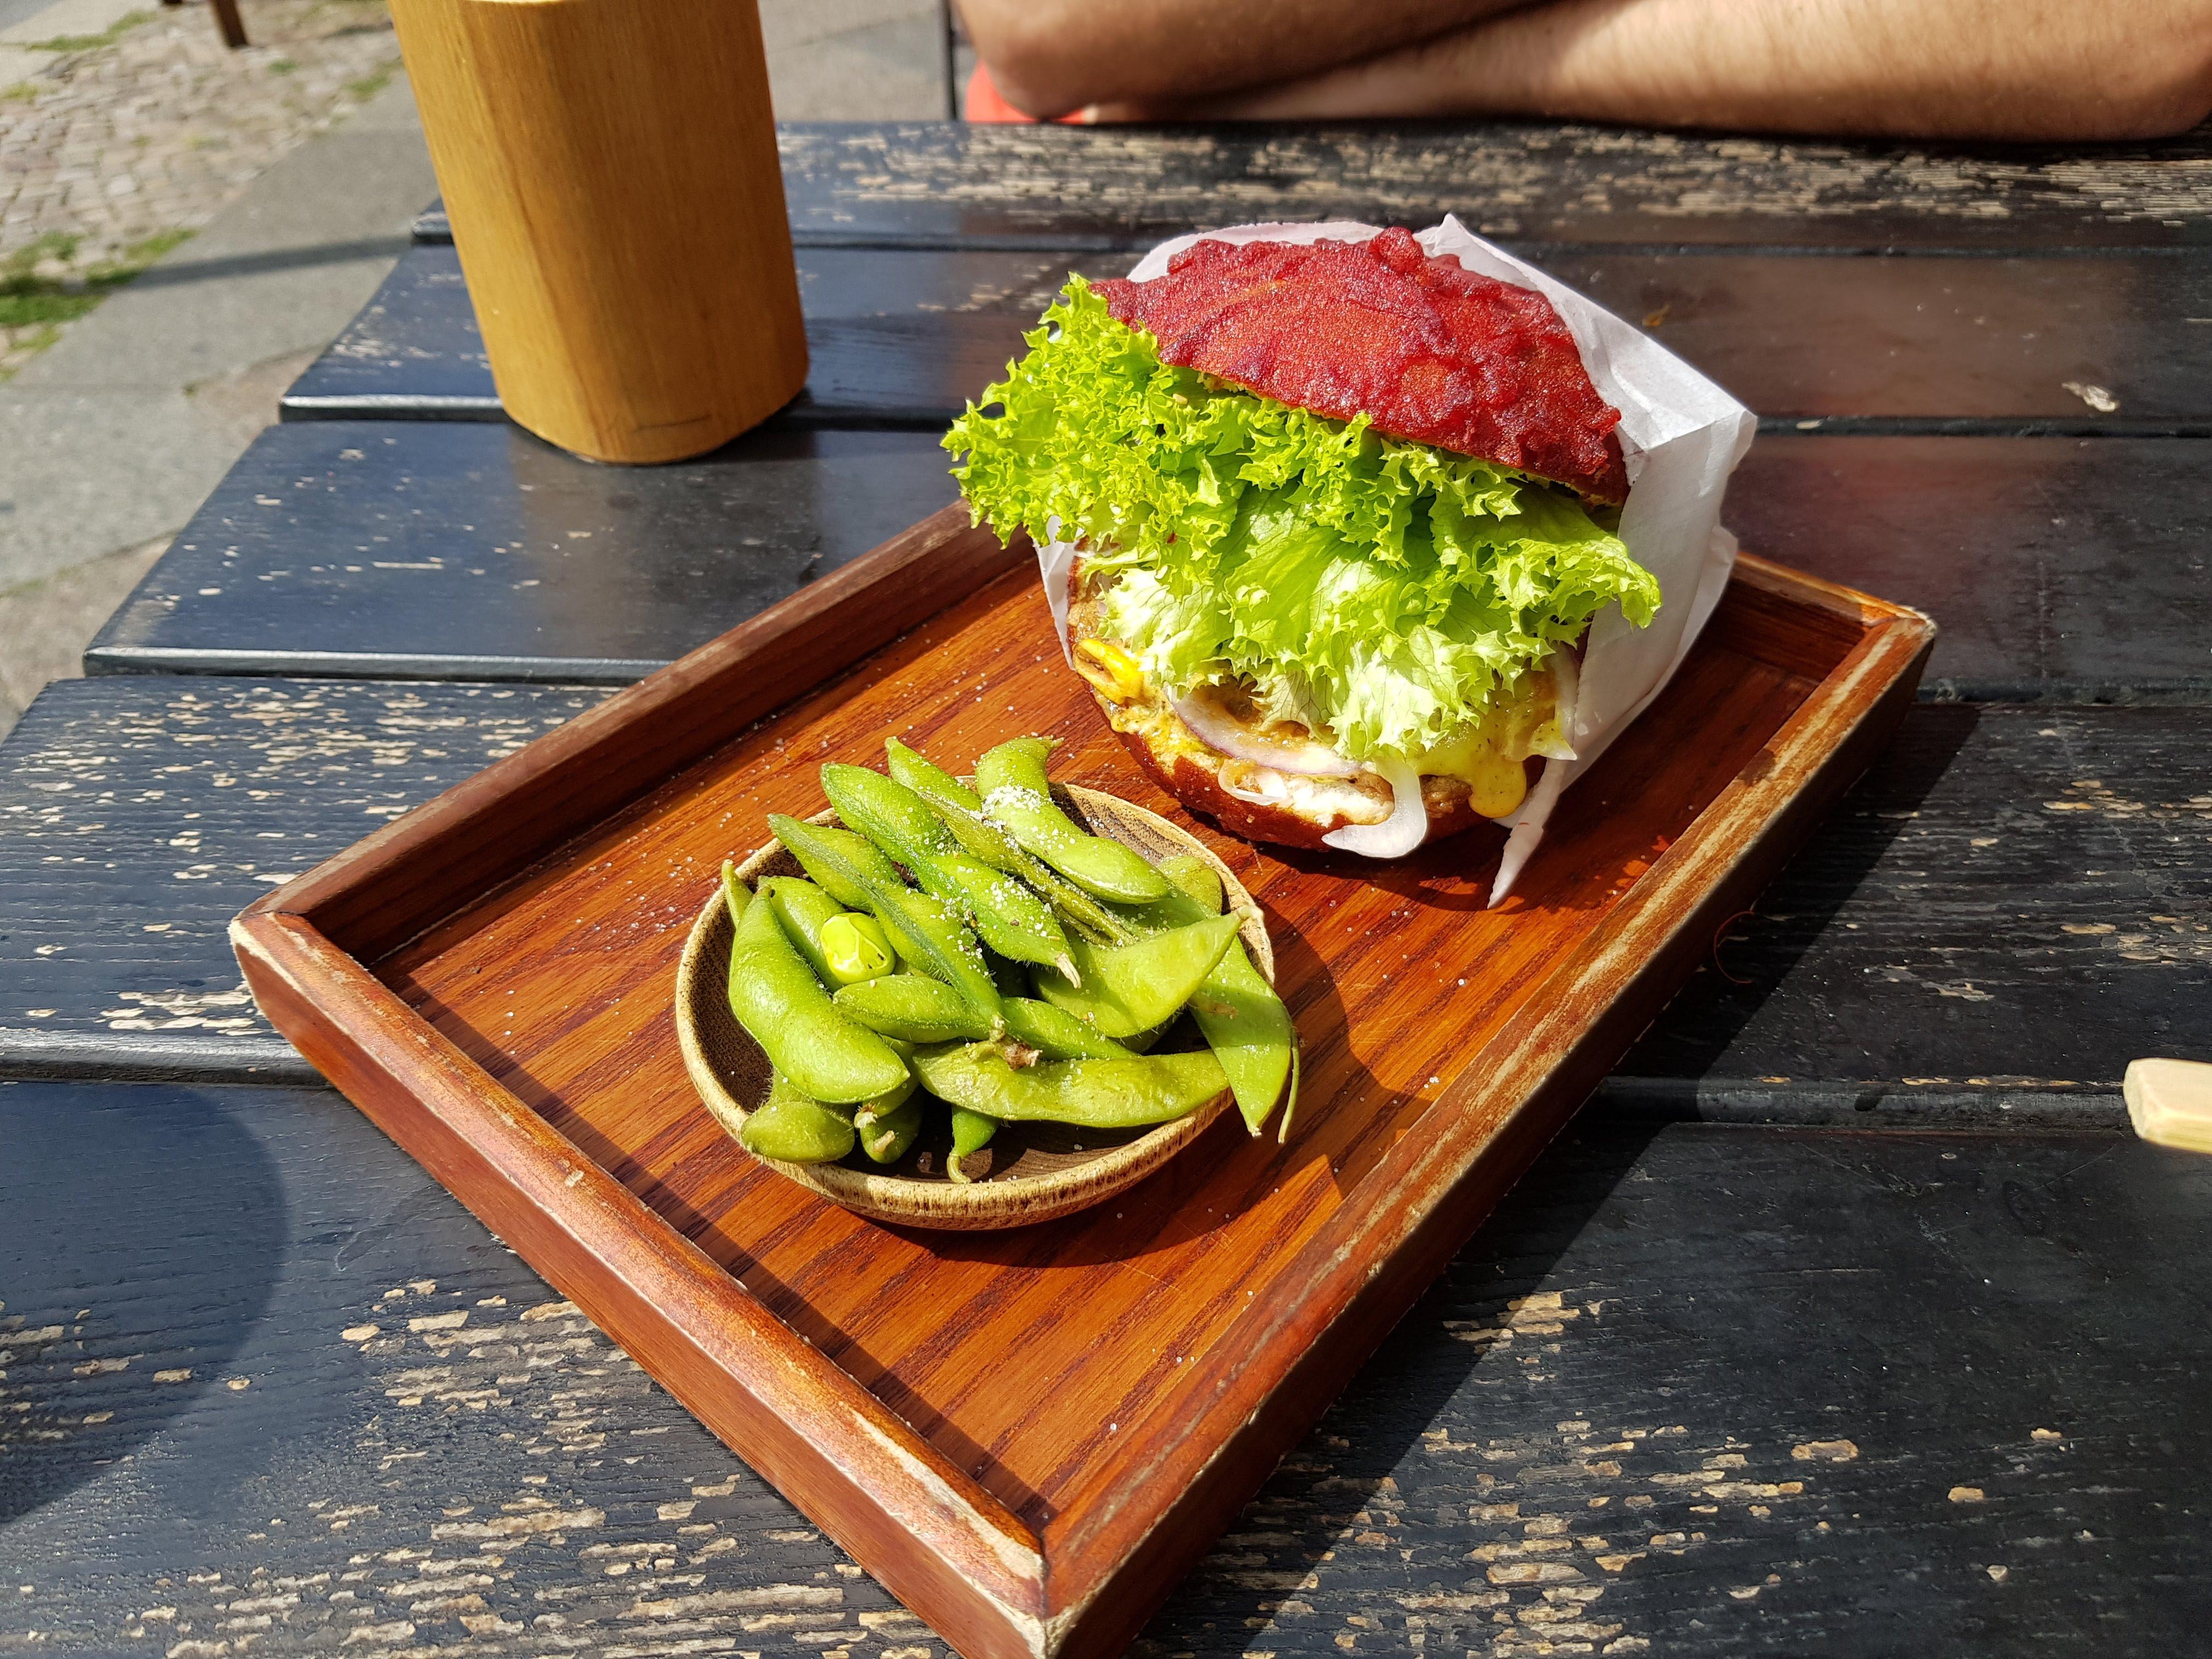 Late Summer Burger, Ryong, Berlin